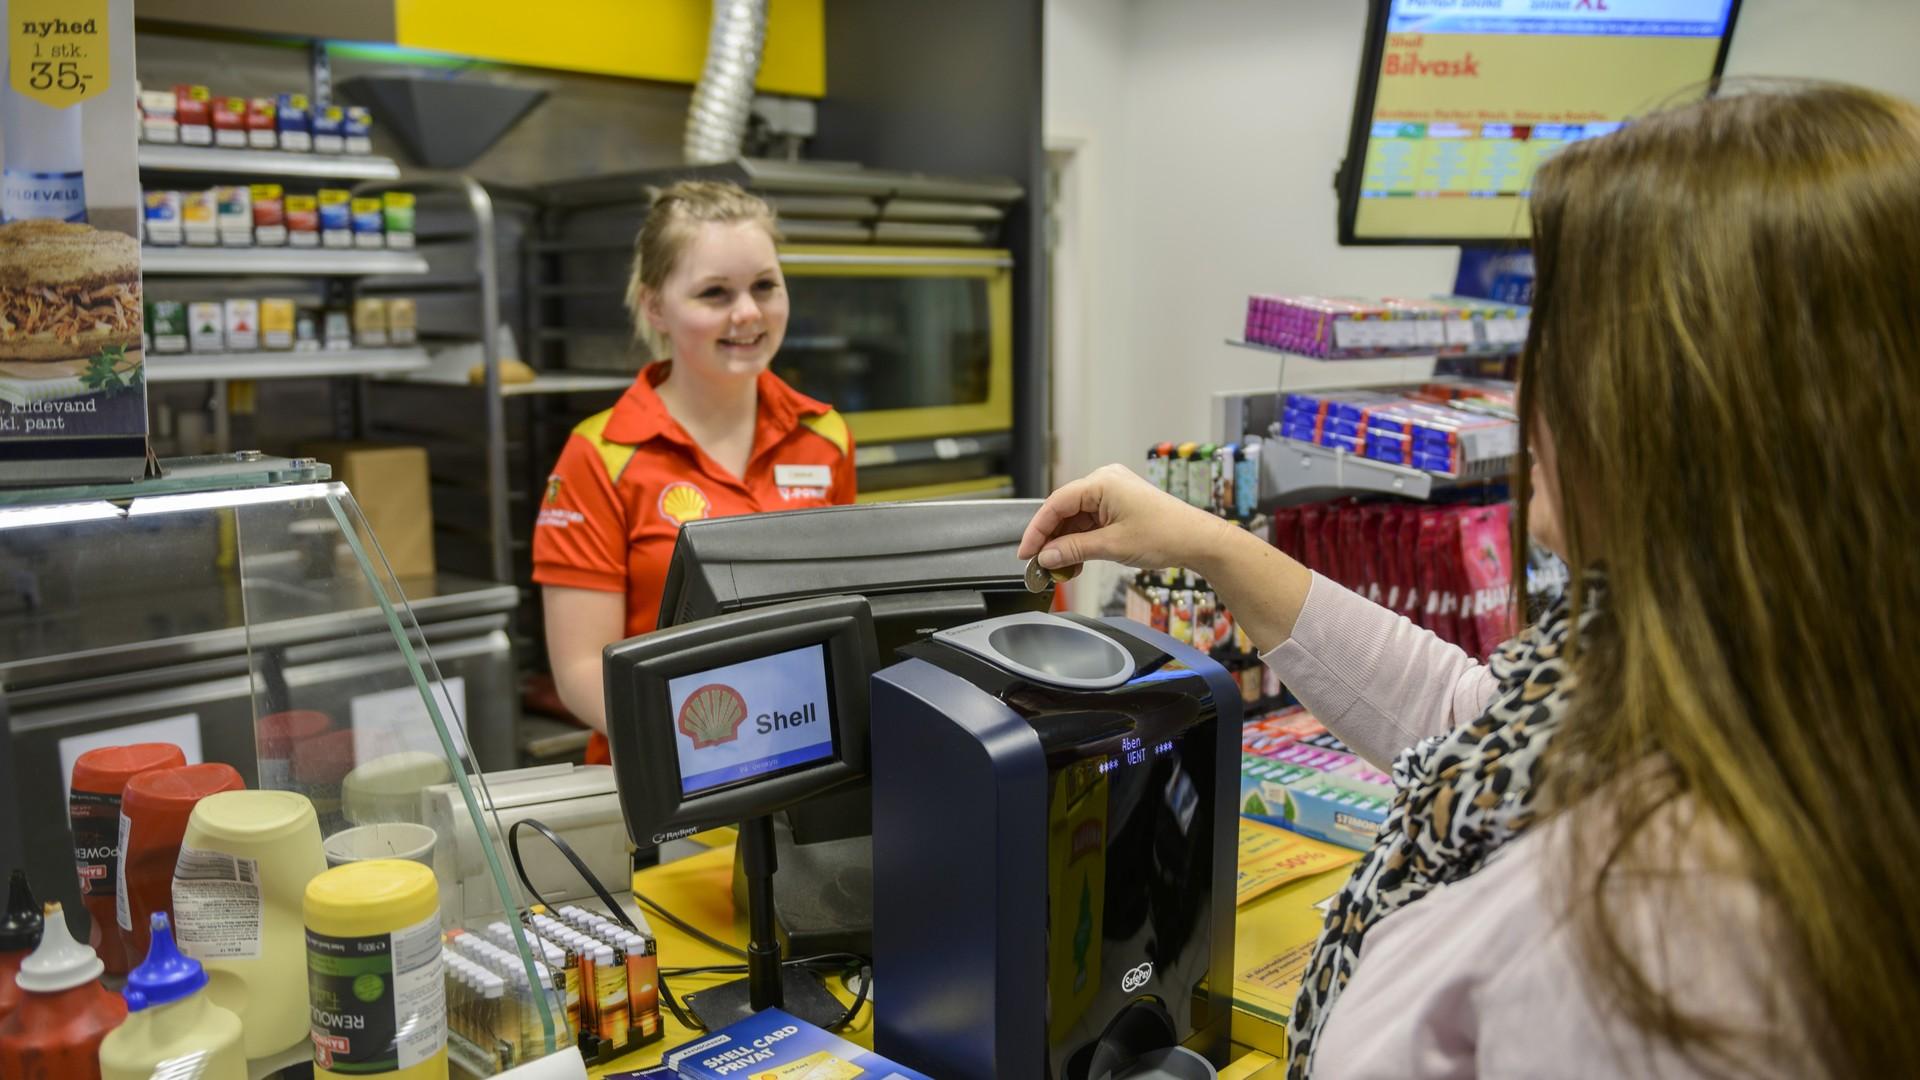 shell gas station safepay cash handling